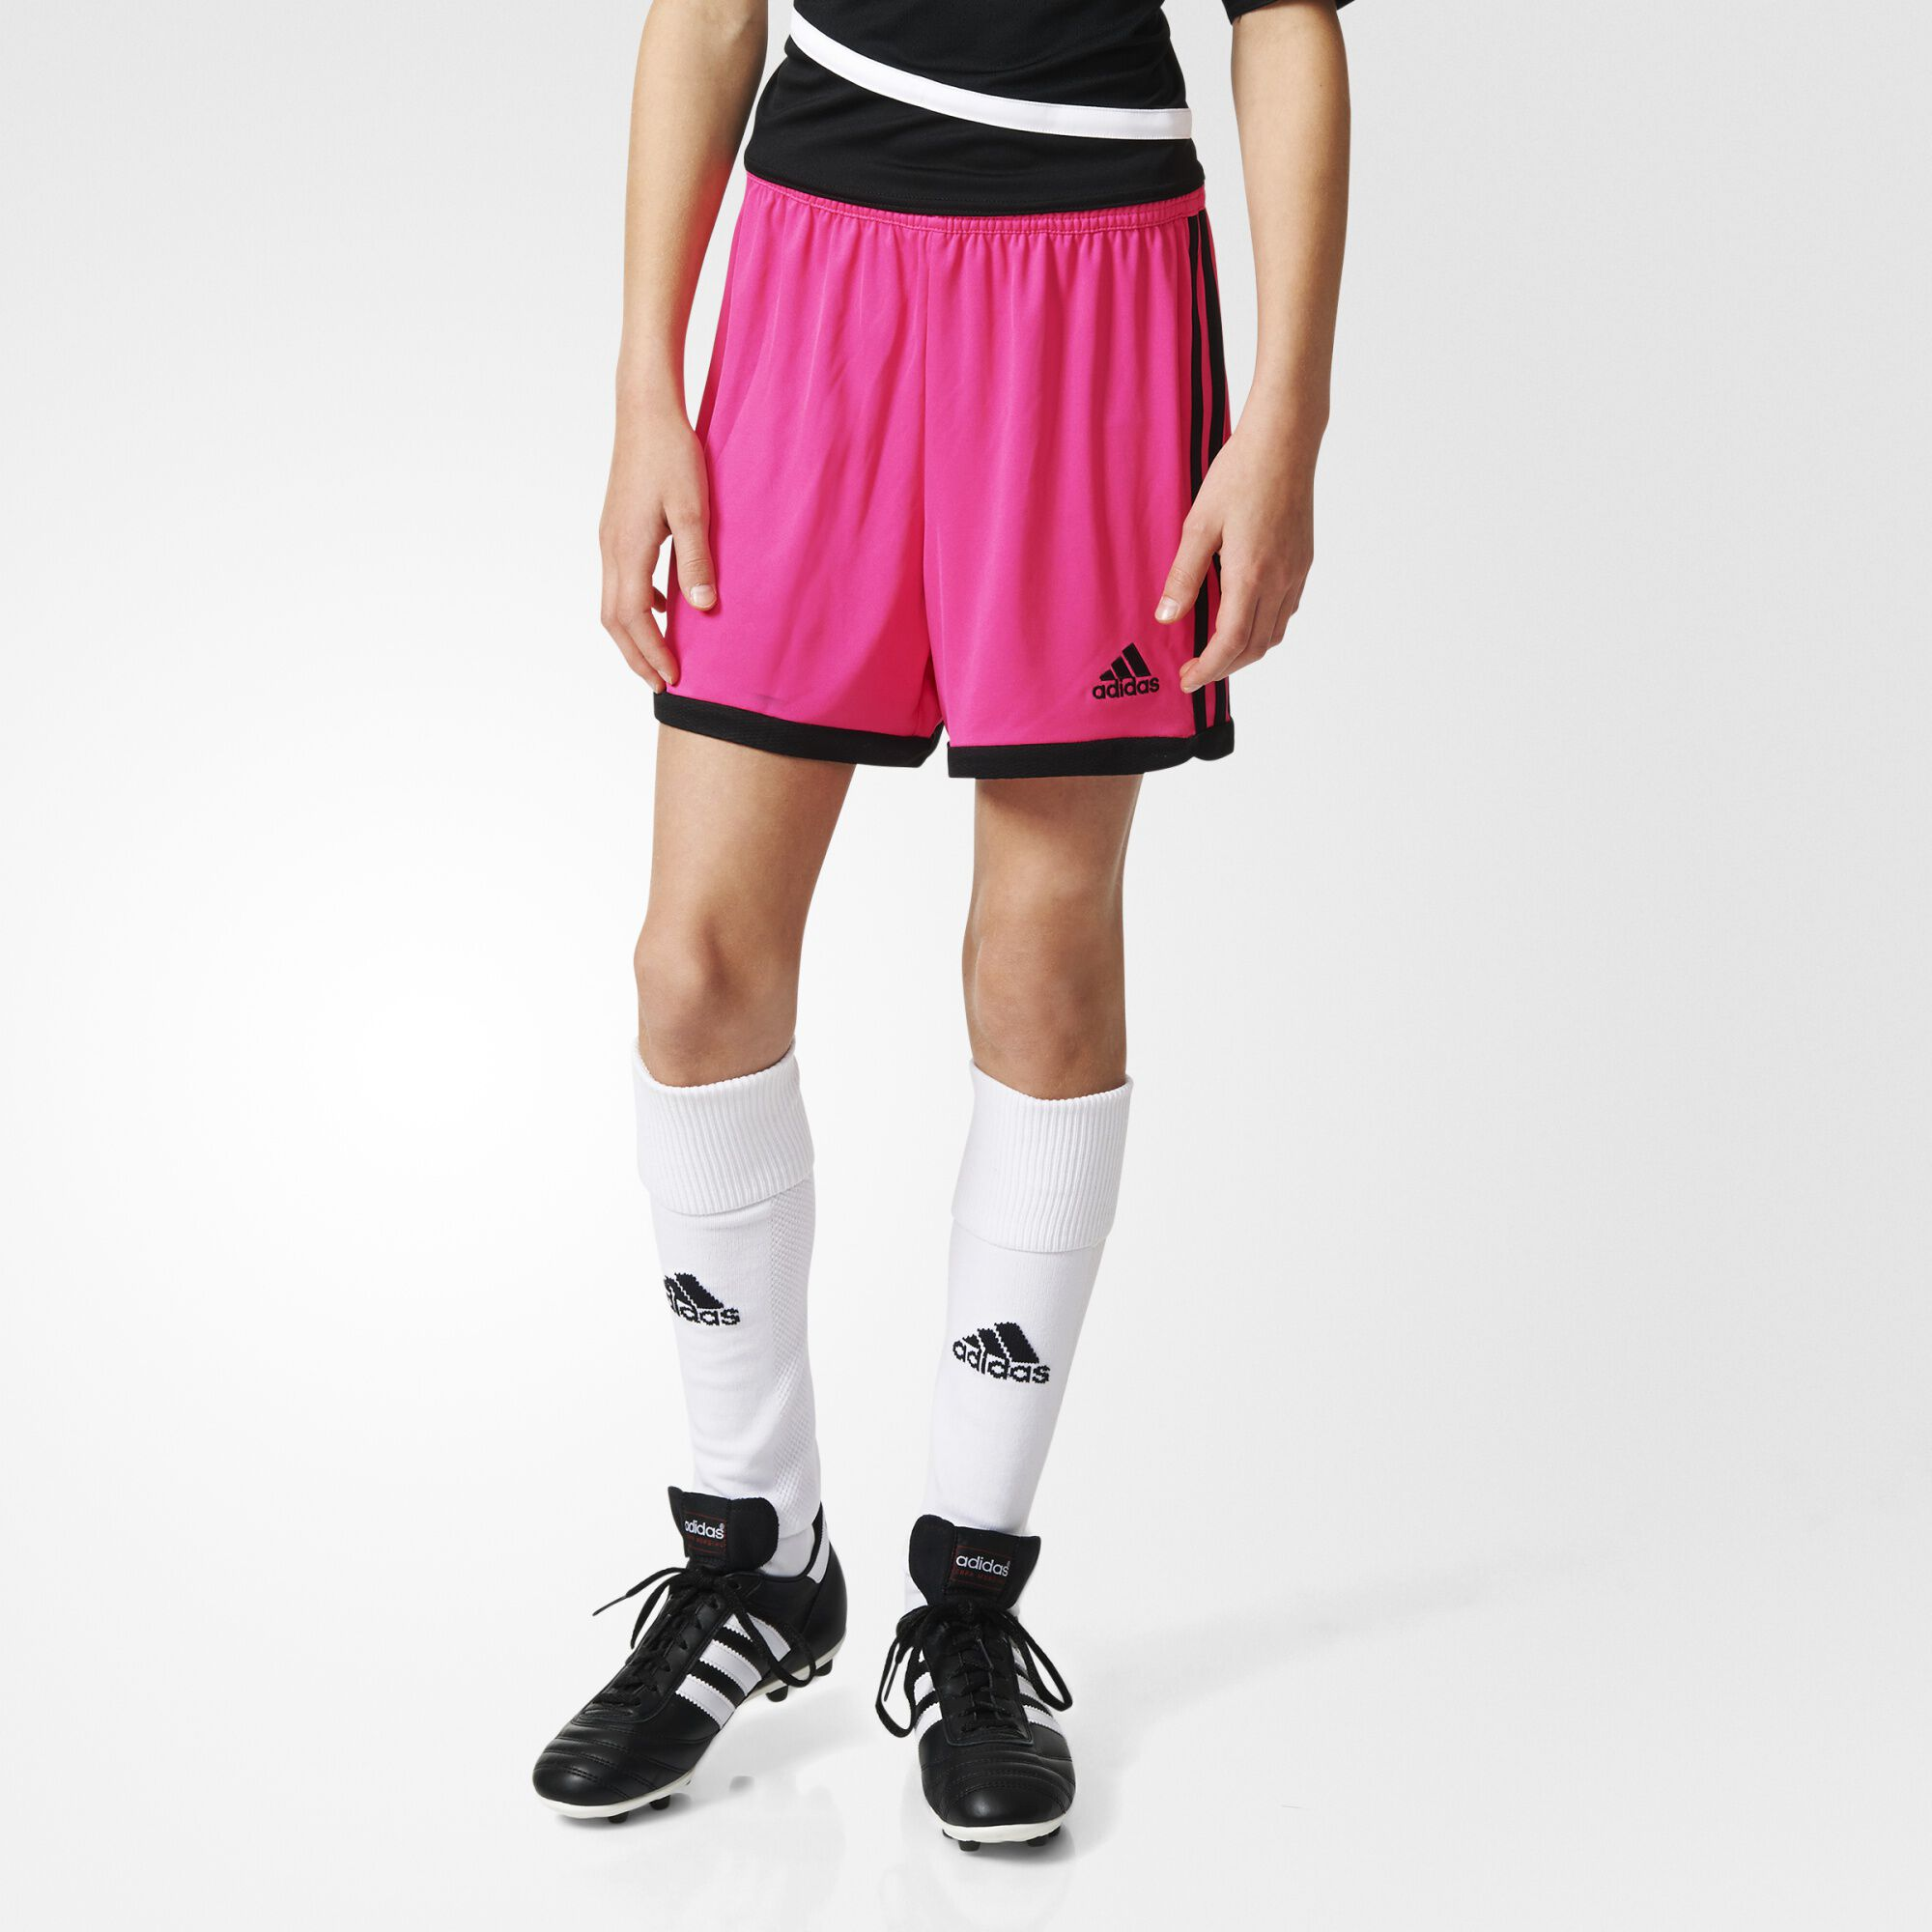 adidas soccer apparel for kids